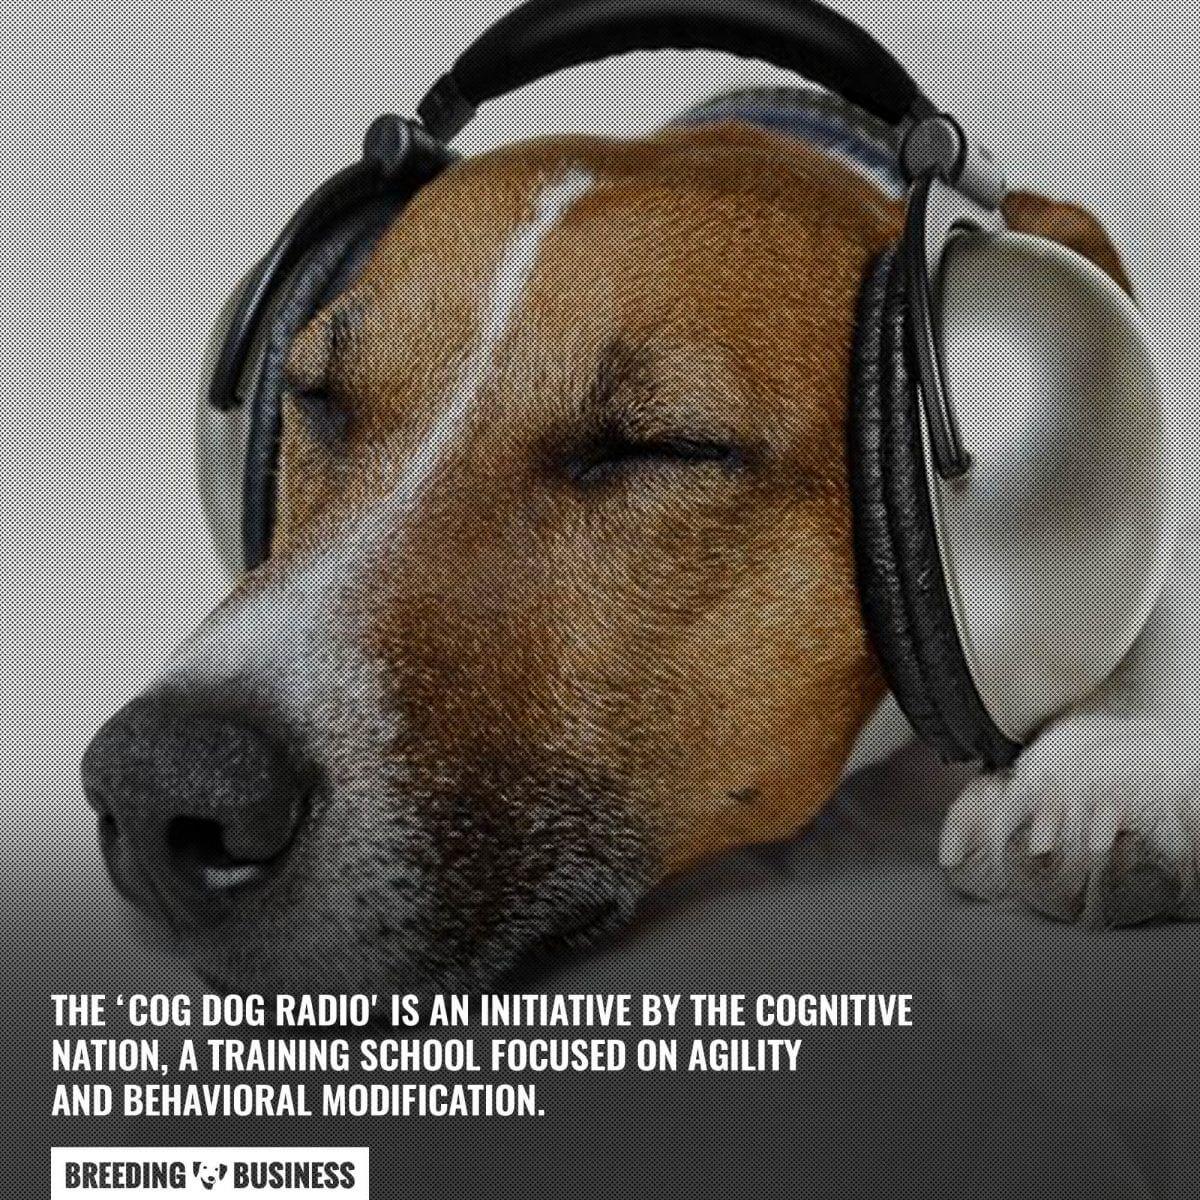 cog dog radio